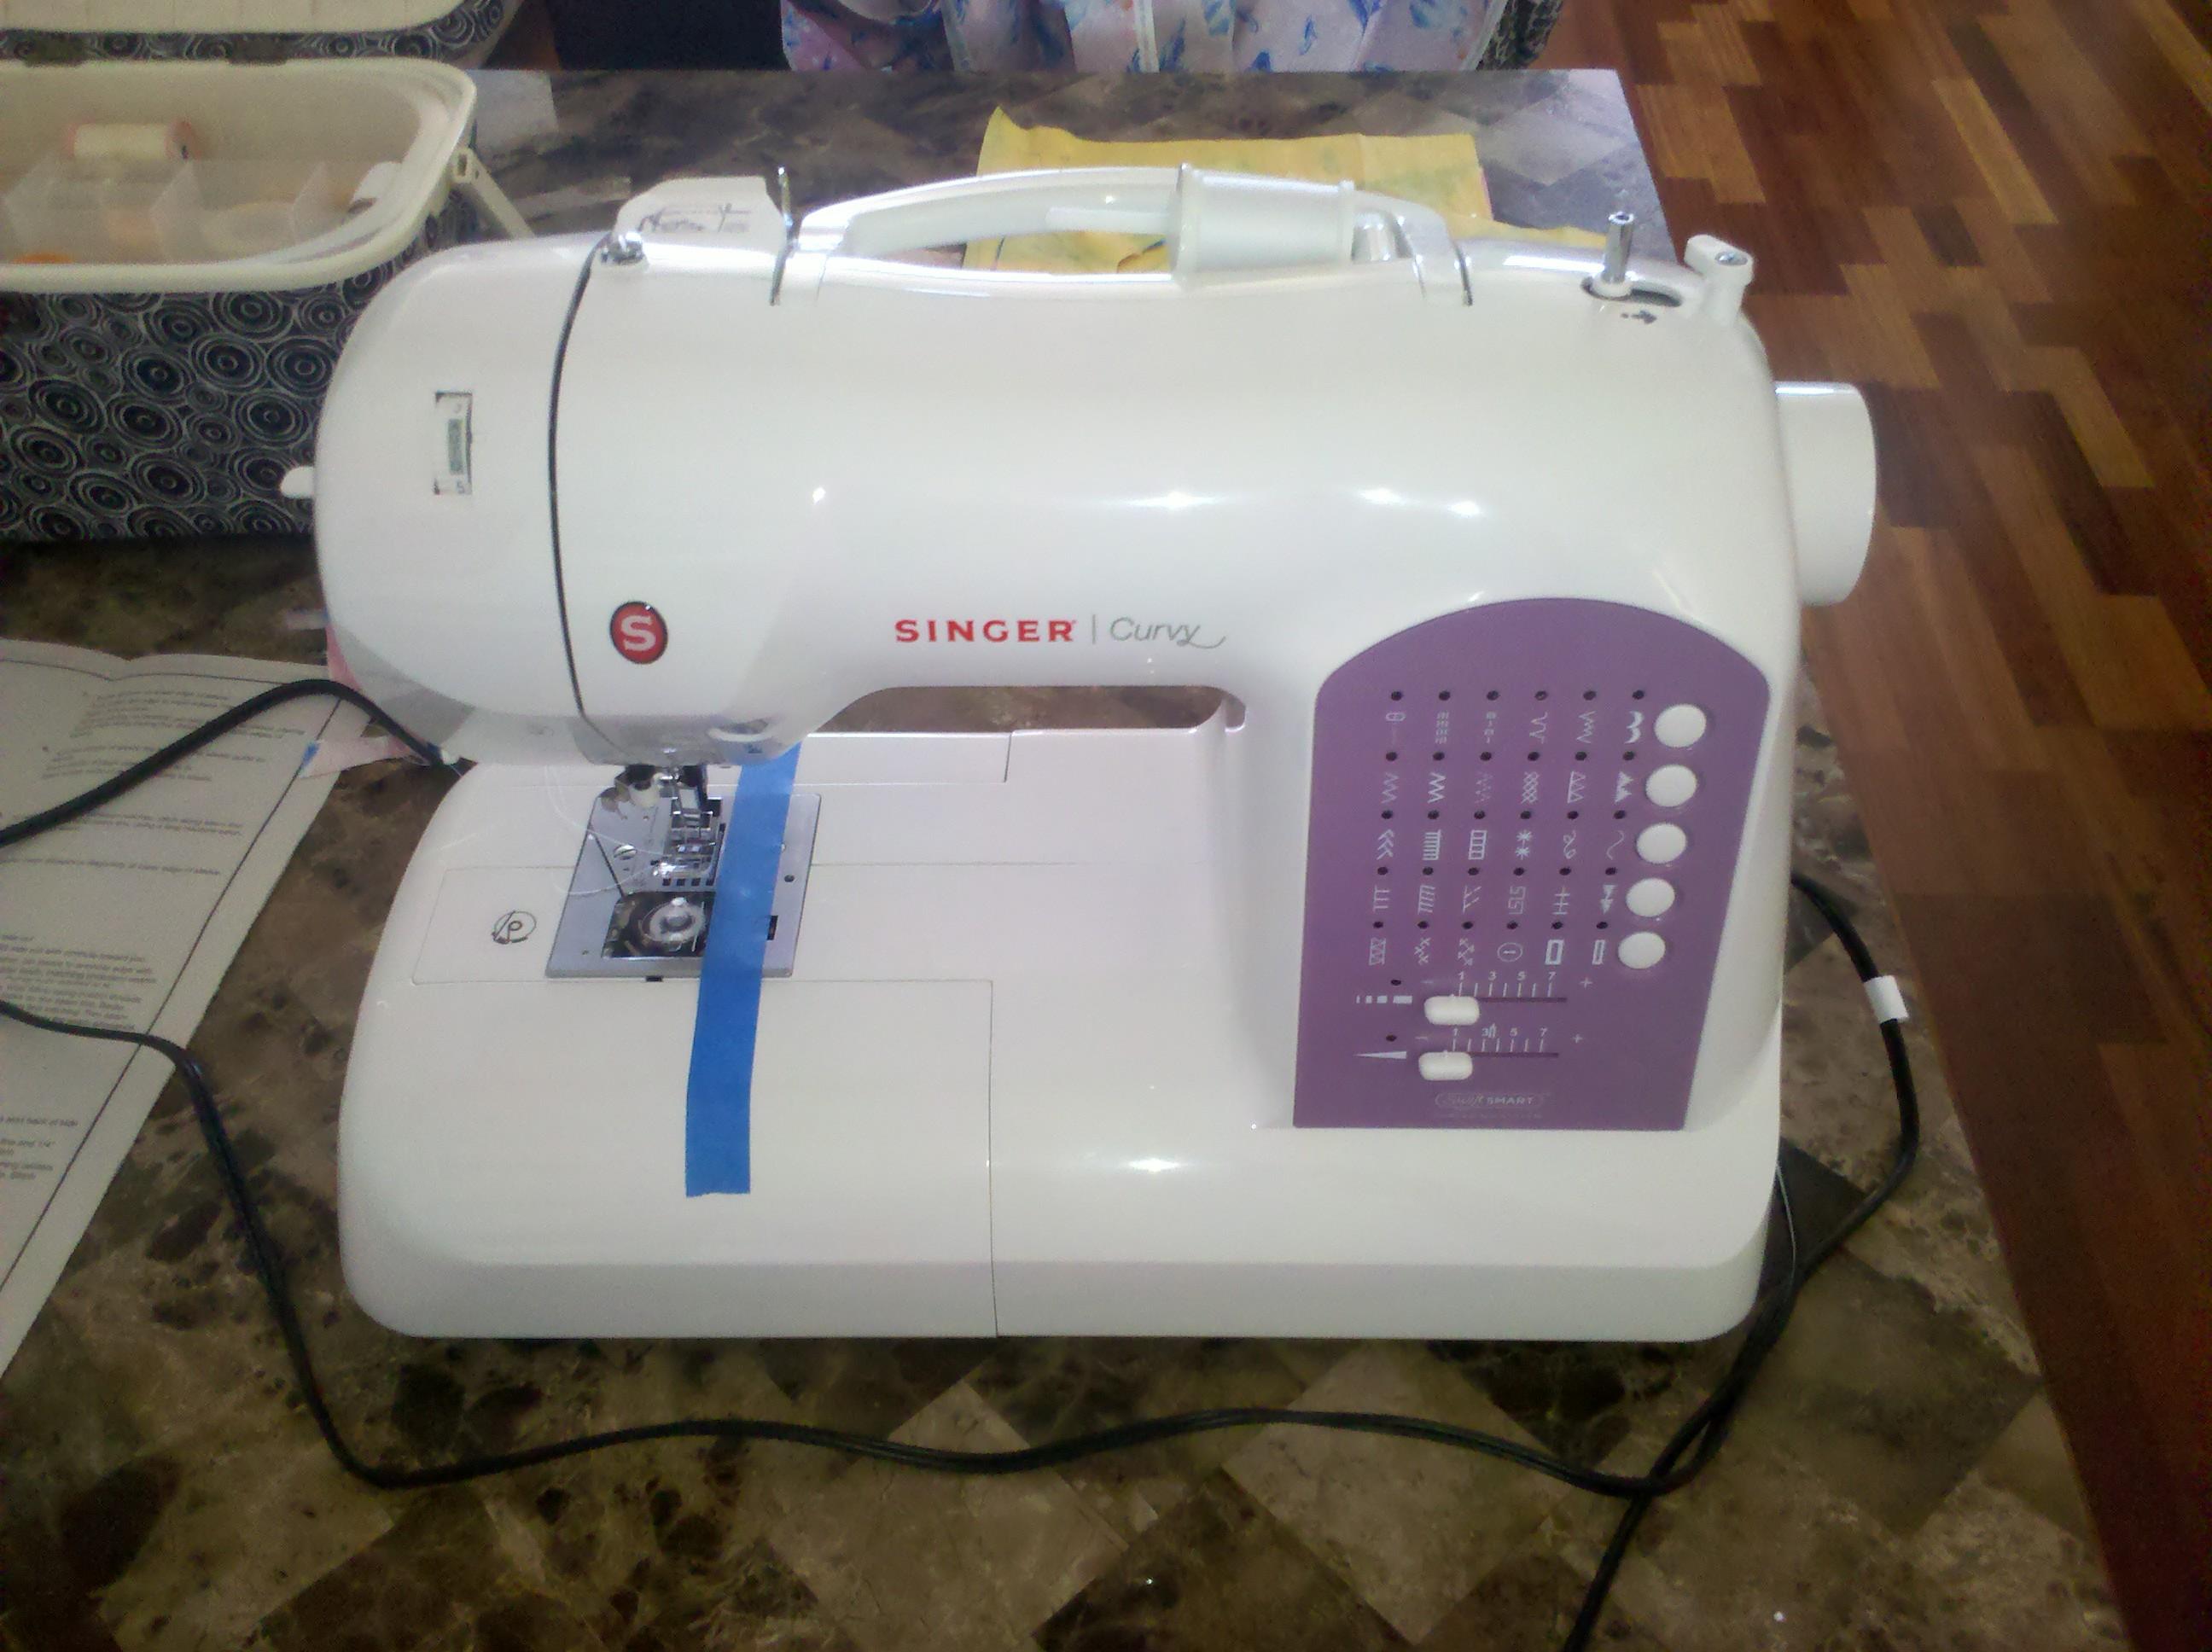 singer curvytm 8763 sewing machine reviews